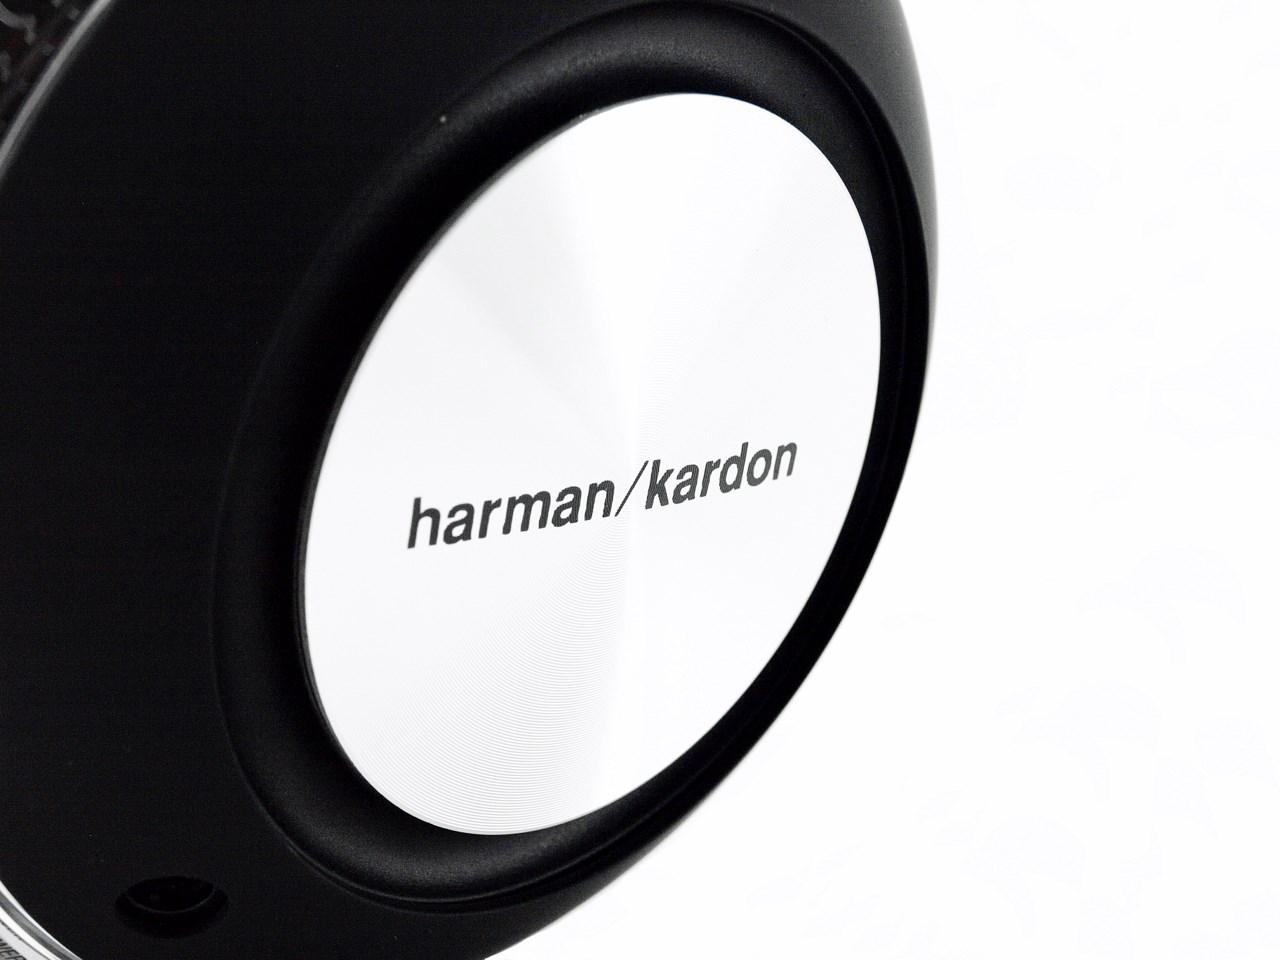 Nikktech Harman Kardon Nova Wireless Stereo Speaker System Review 1 Us Blaster Products Car Audio Wiring Kits Usb 6128 16t